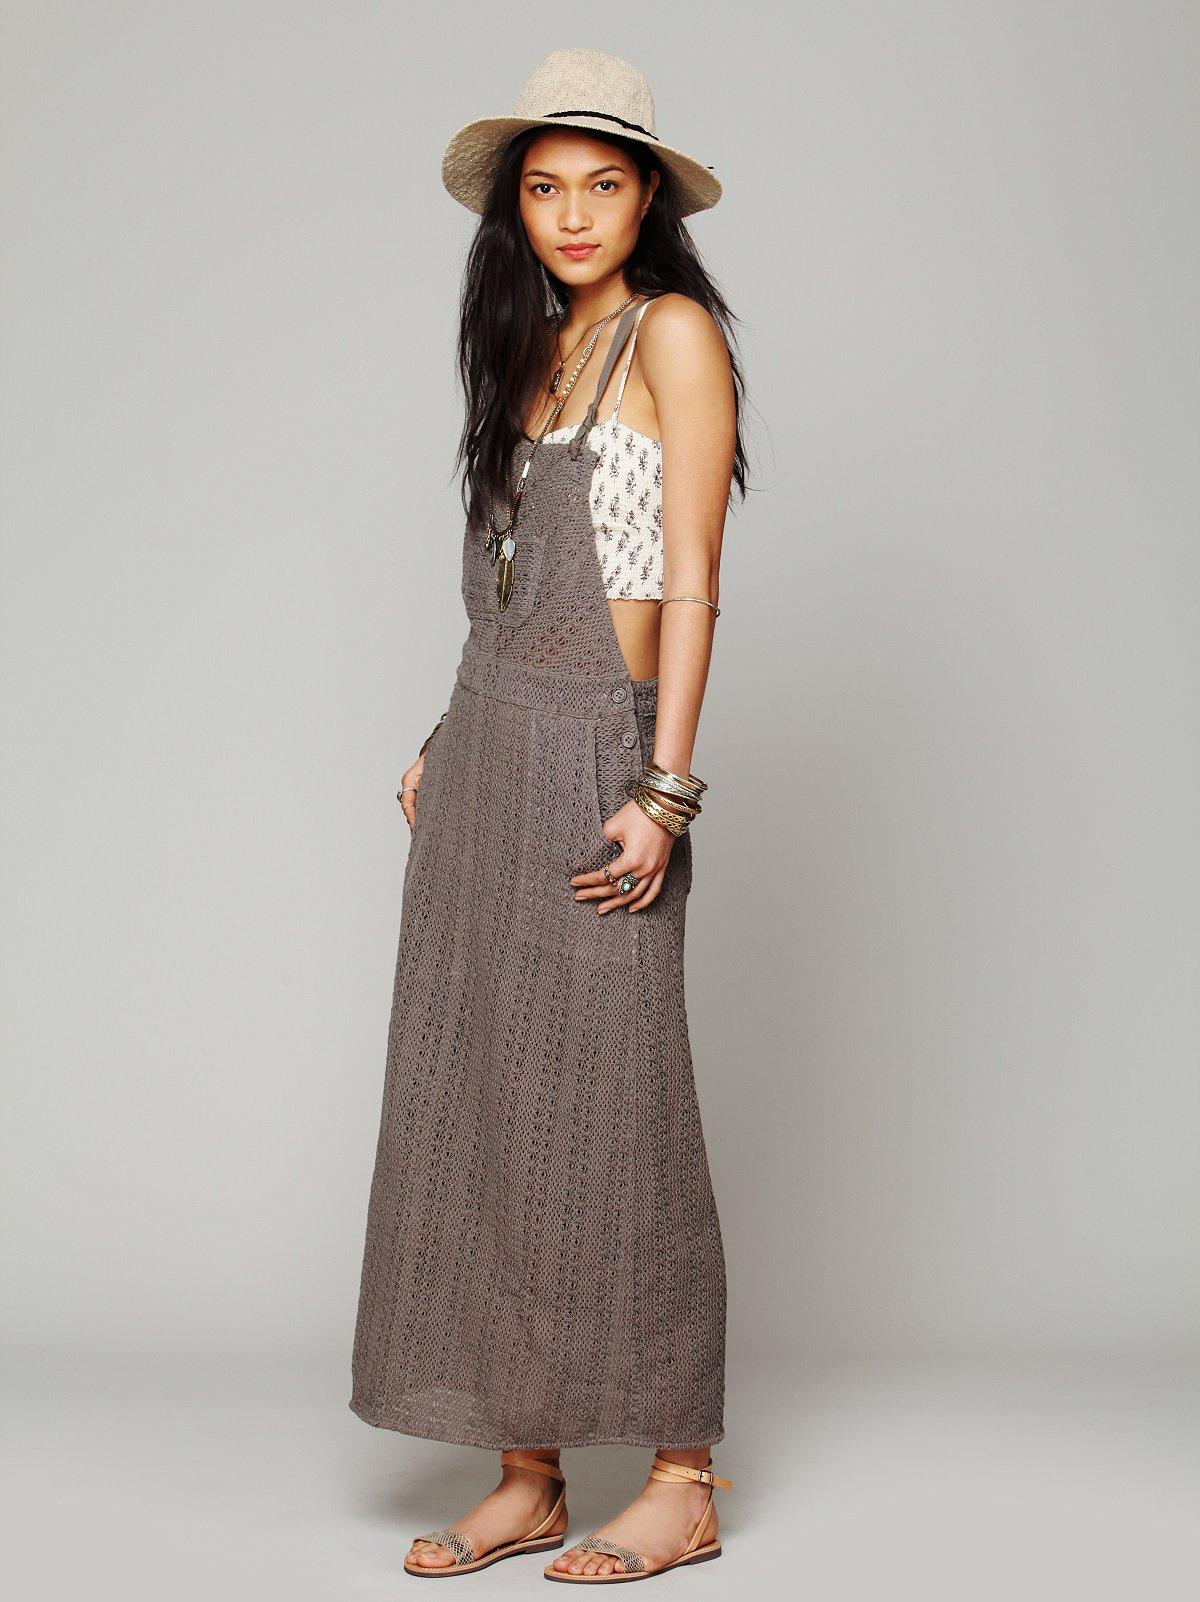 Feder Overall Dress